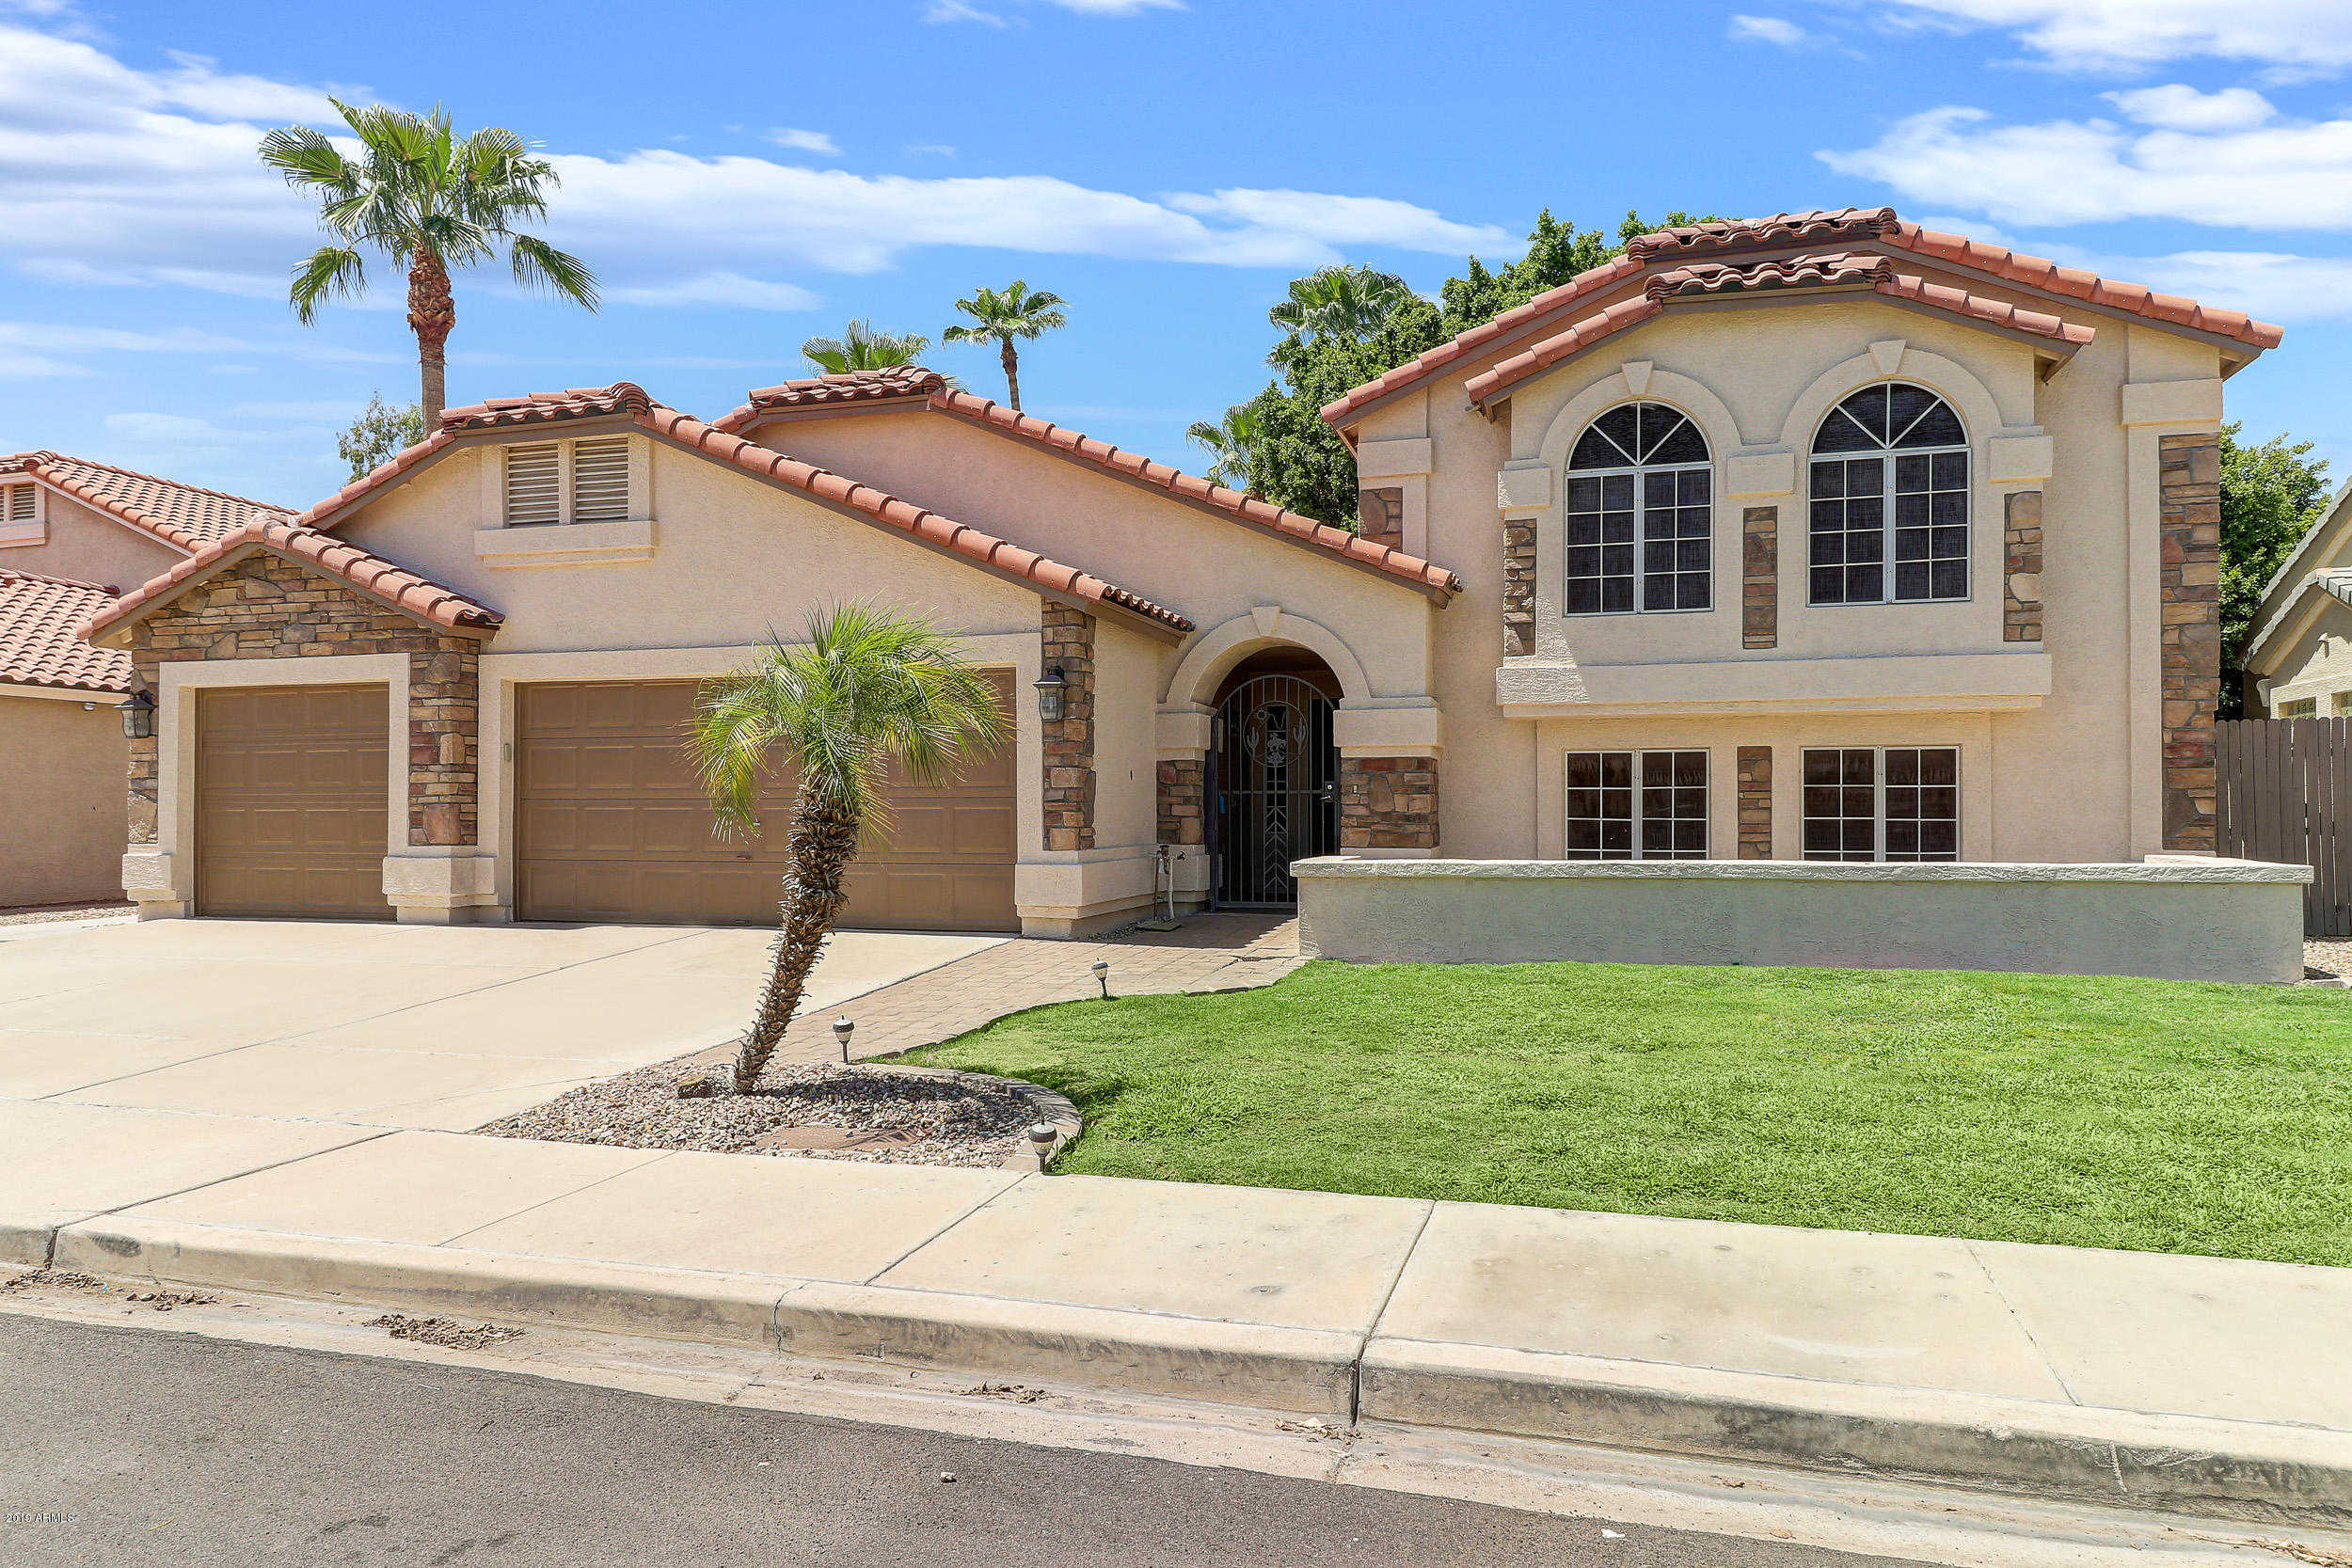 $395,000 - 5Br/3Ba - Home for Sale in Arrowhead Oasis, Glendale